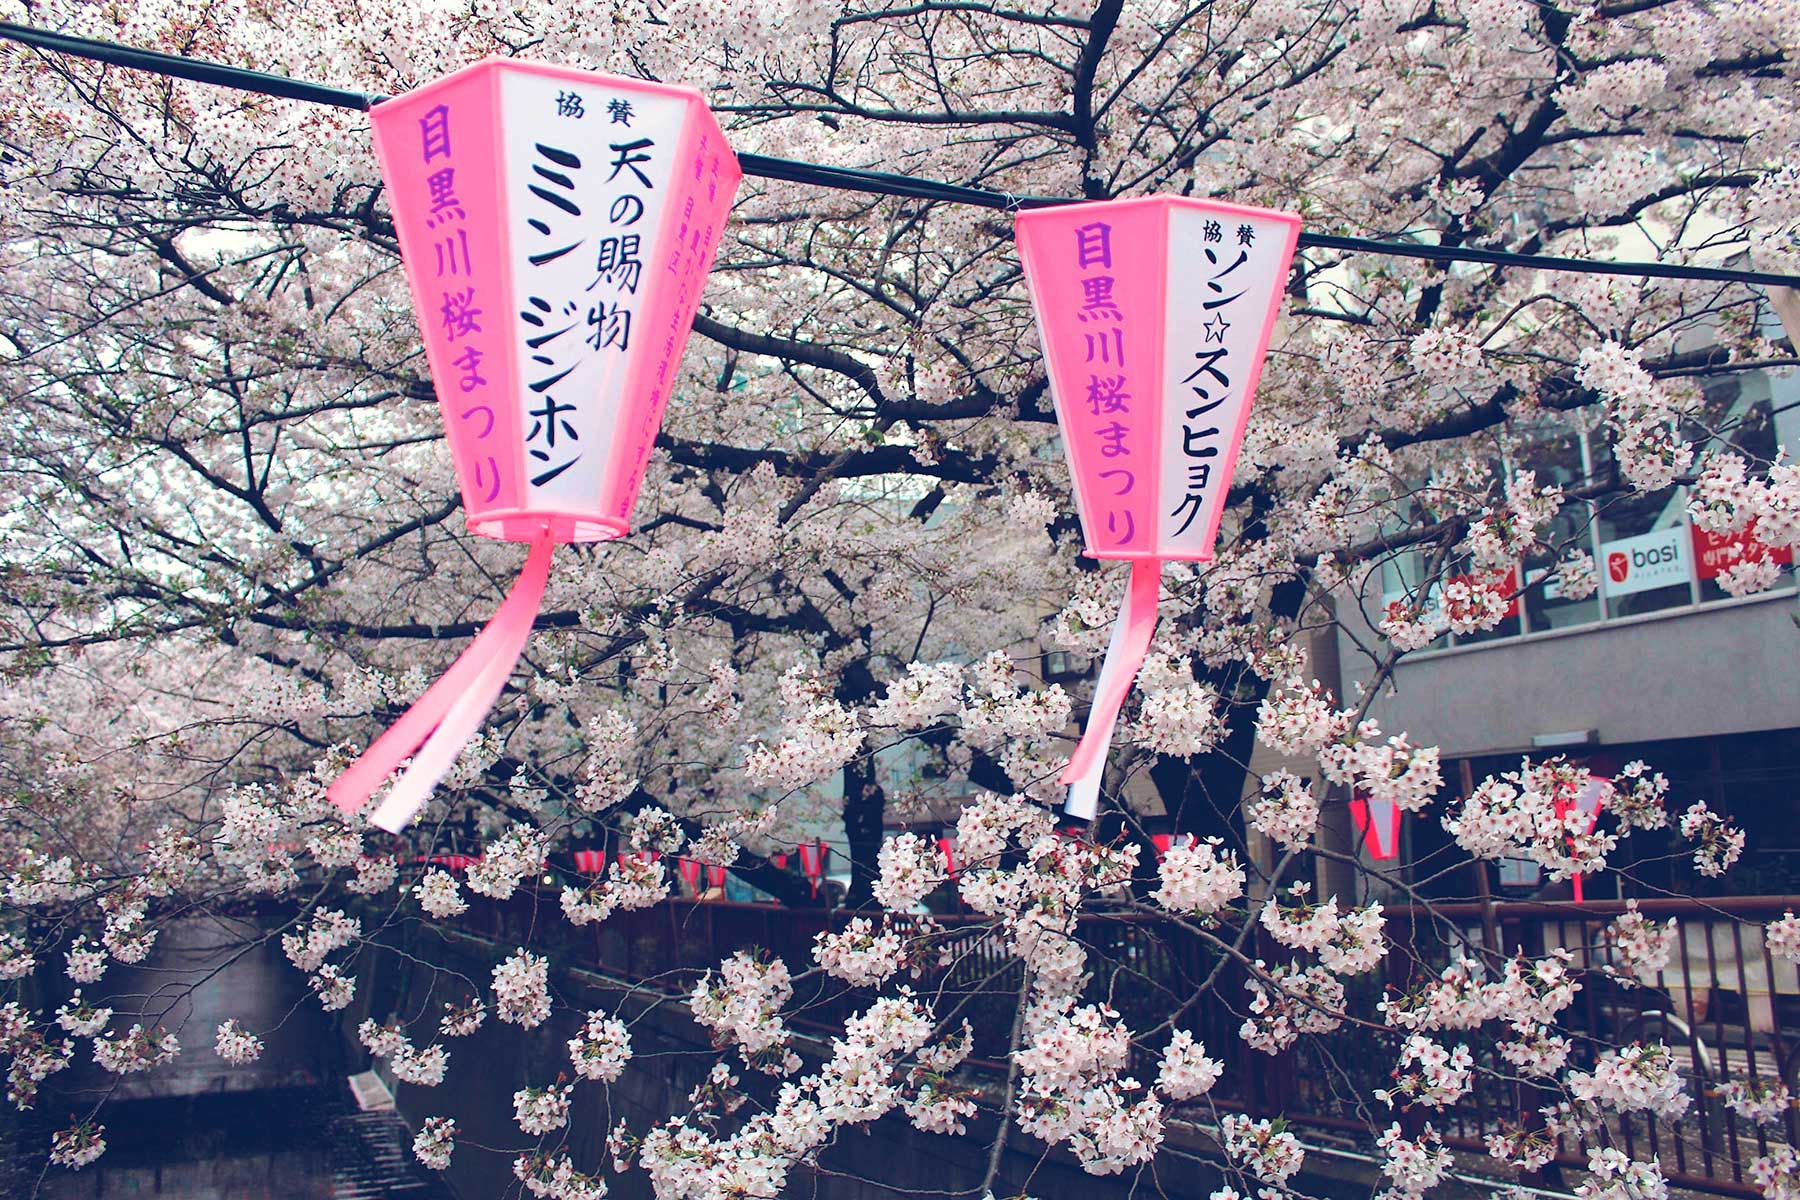 Sakura Spotting in Tokyo, Kawagoe, and Odawara, Japan - PearlMargaret.com